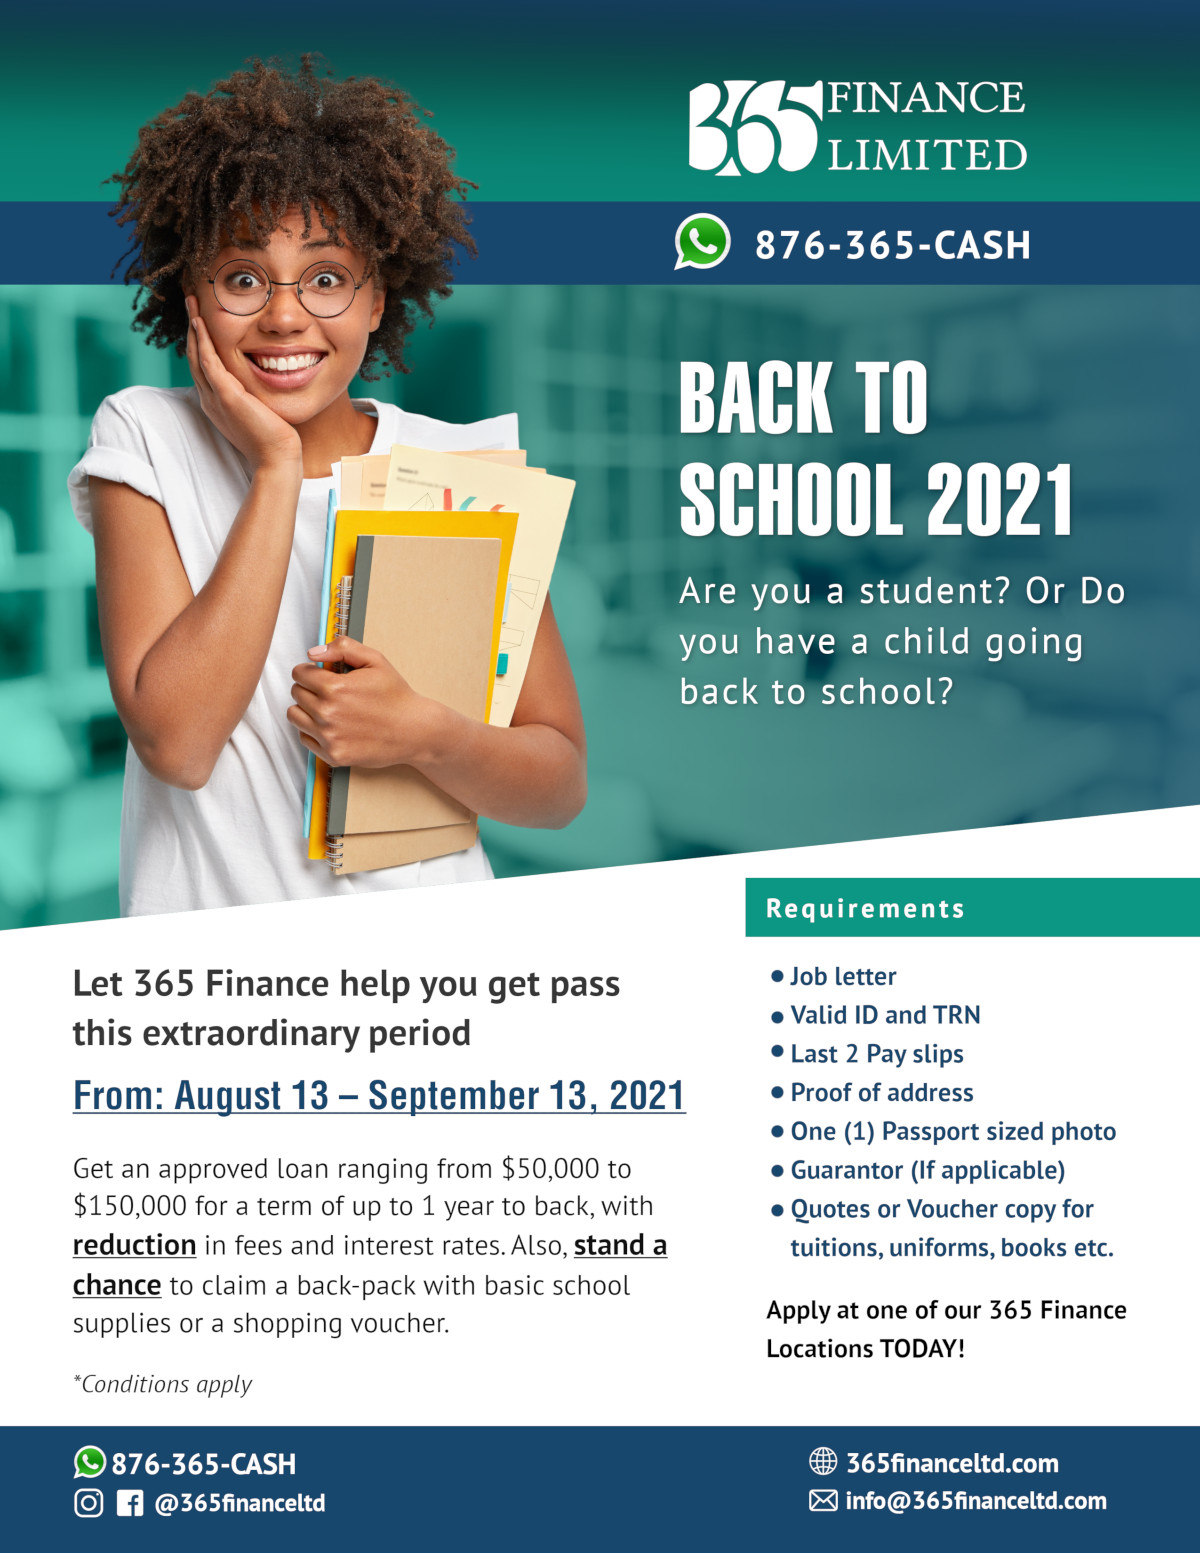 365 Finance Limited Back to School Flyer Promotion